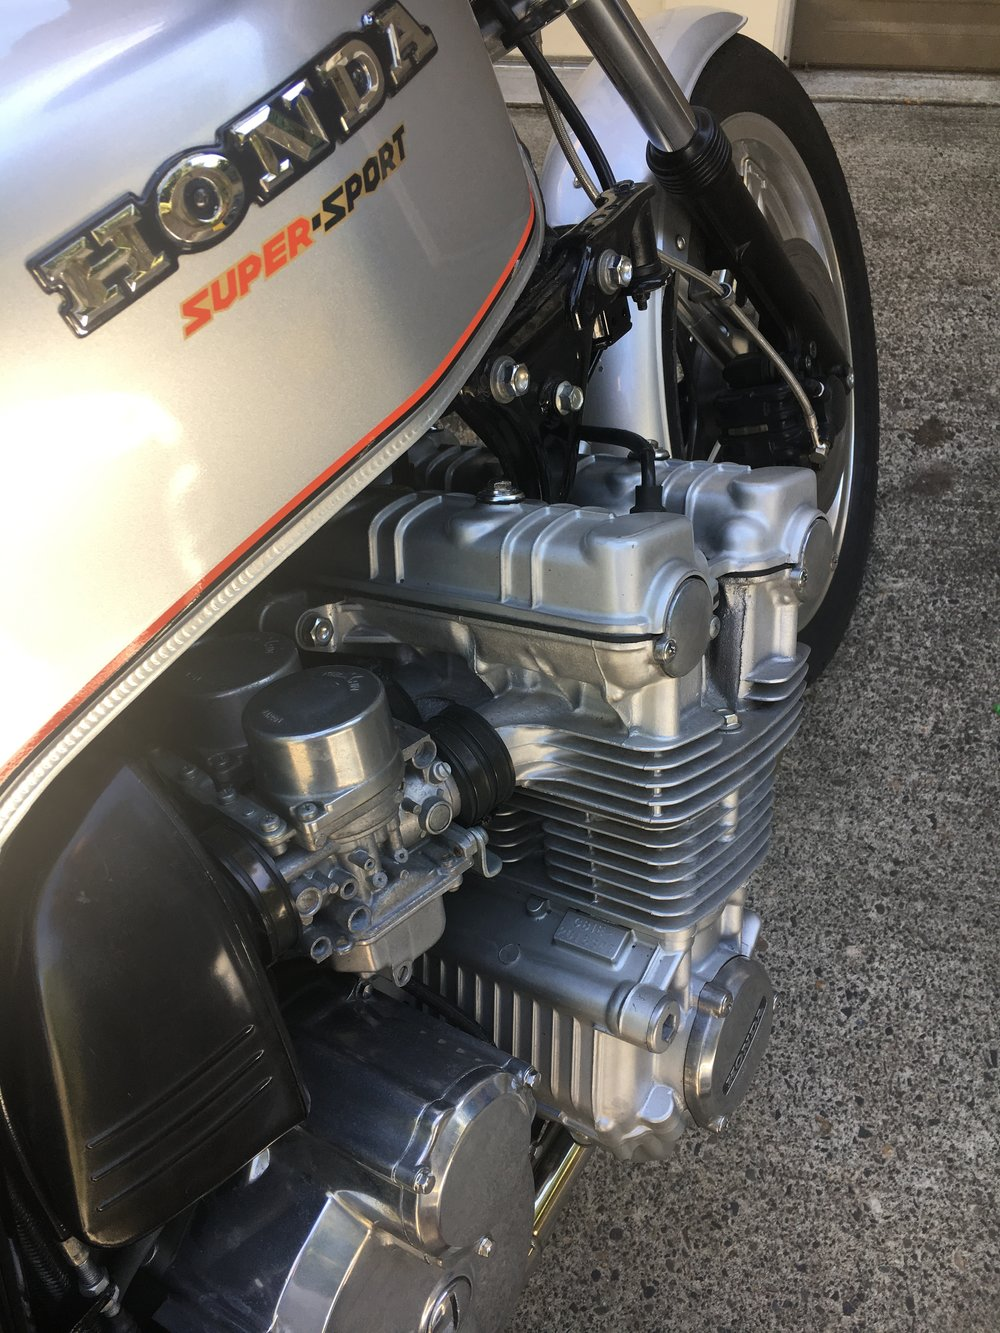 The Honda CBX engine always makes a statement.